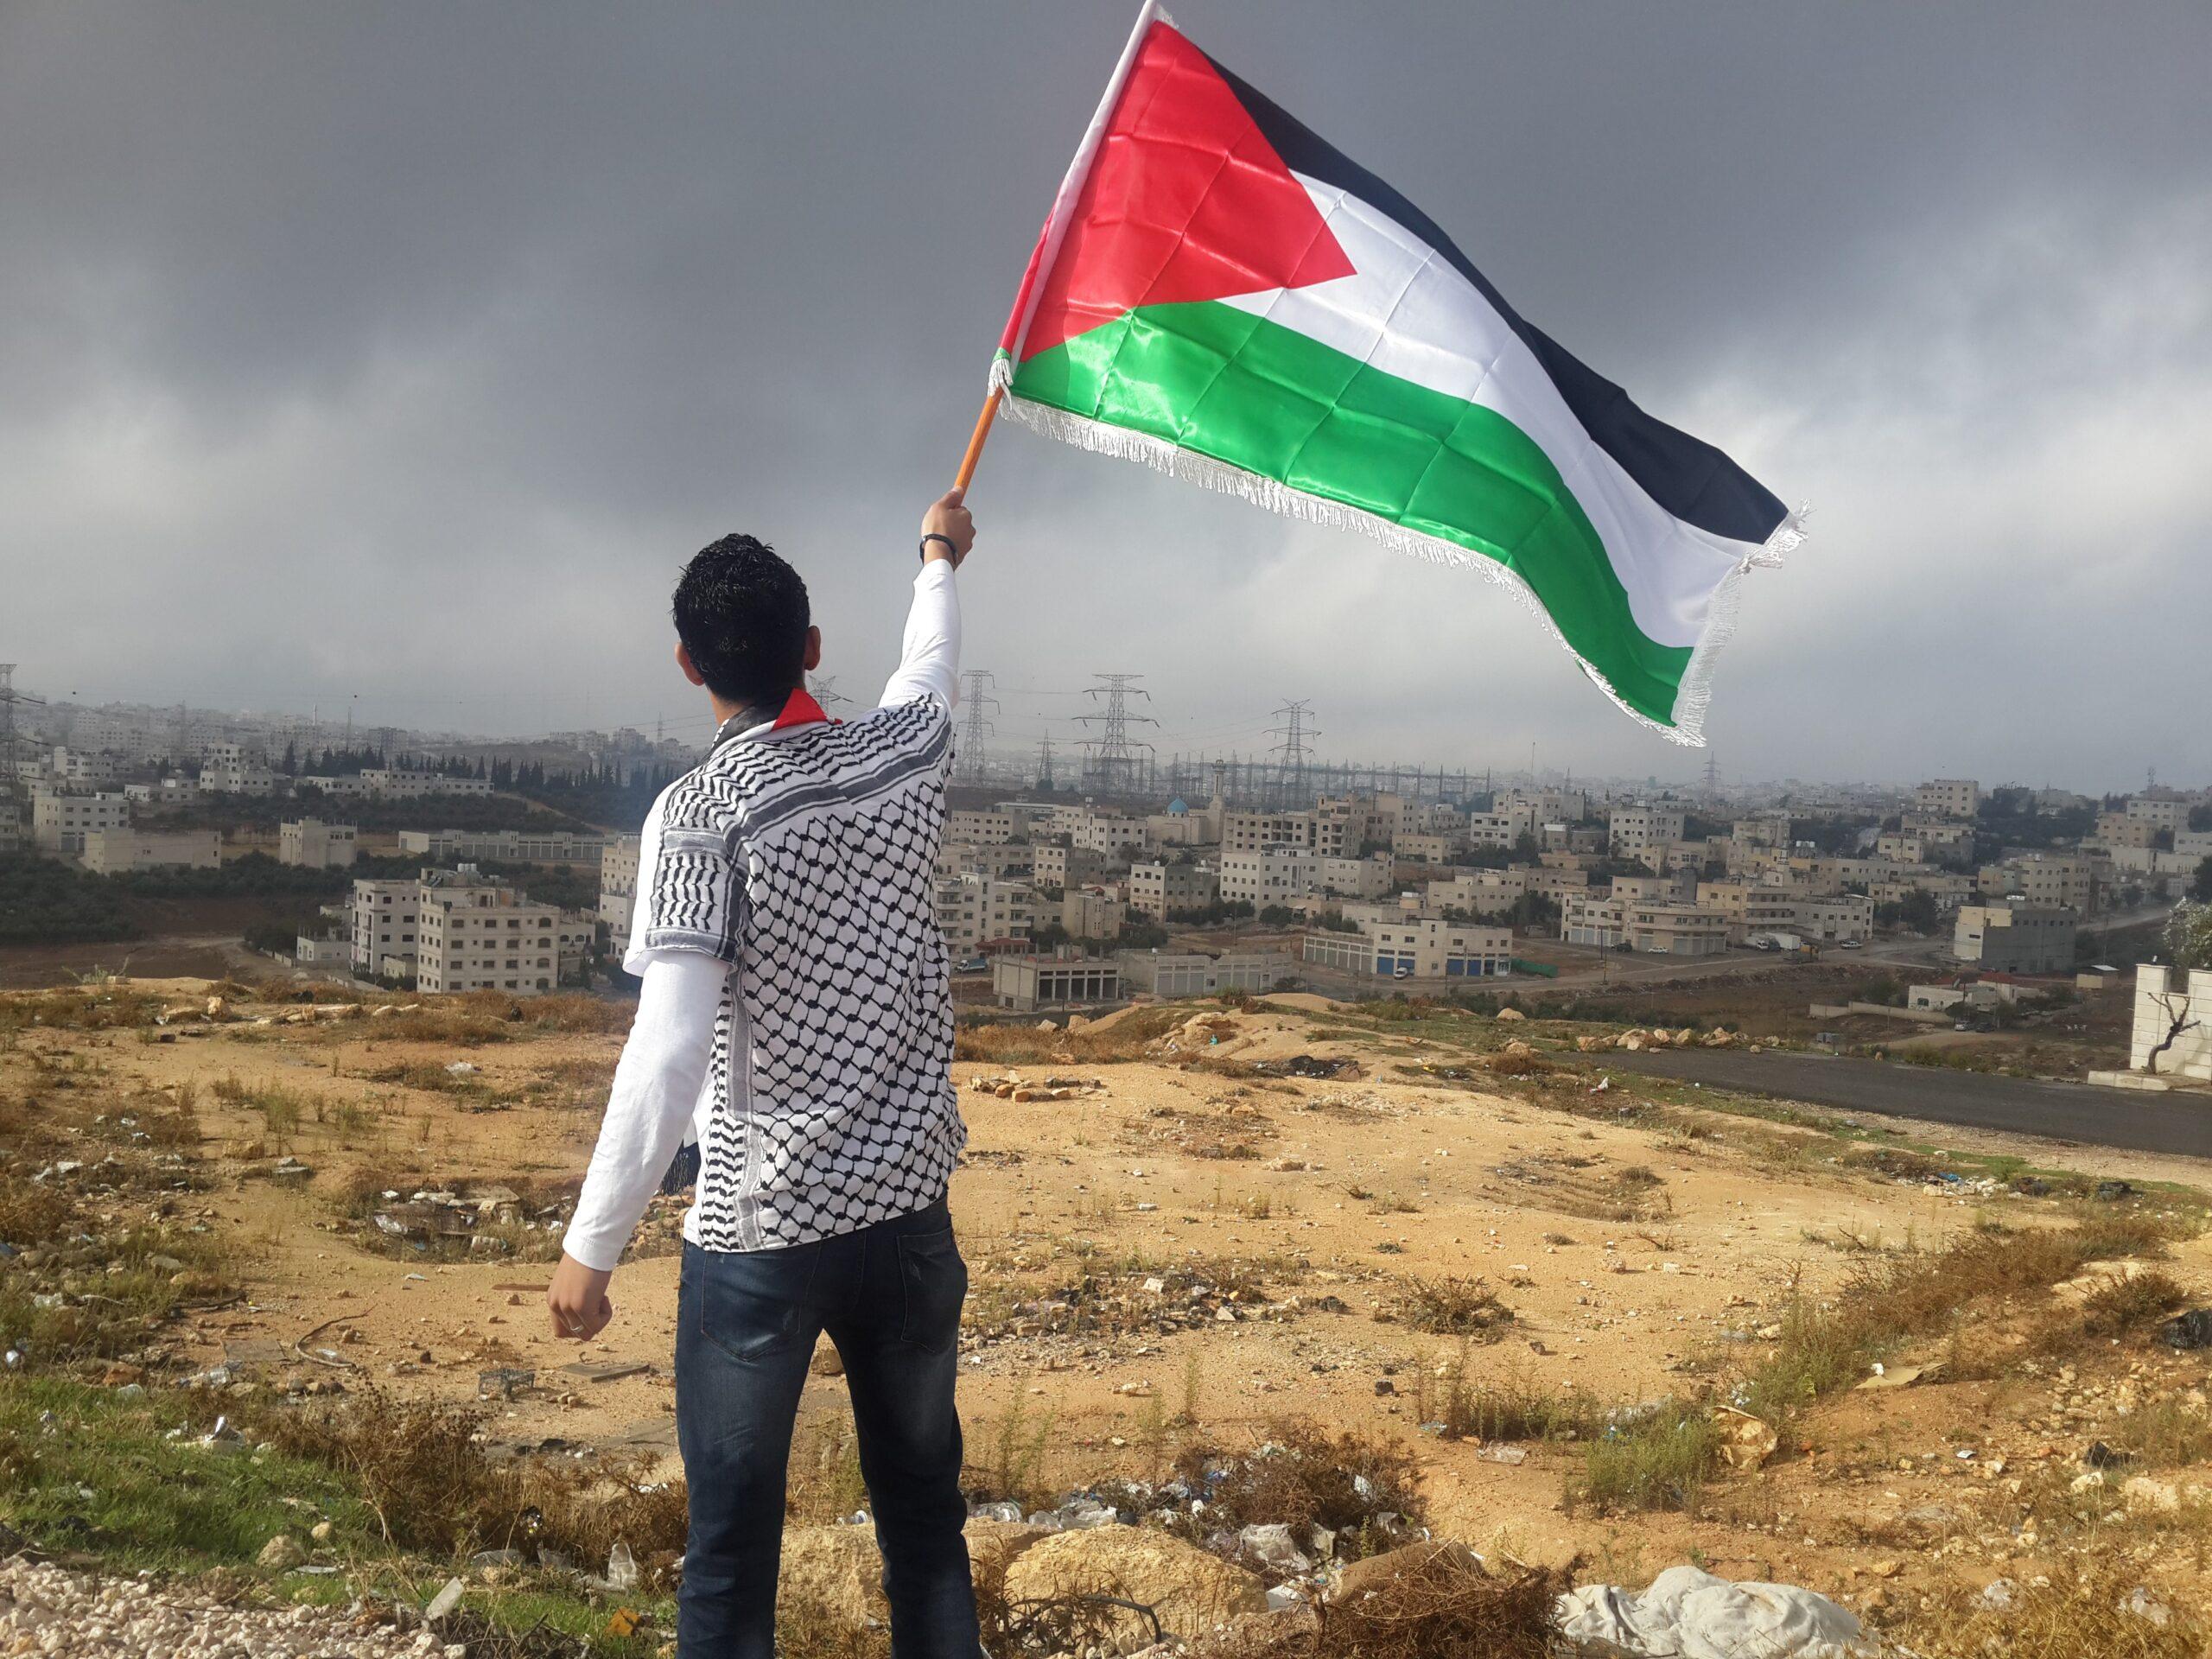 Demolishing More Than Just Palestinian Homes